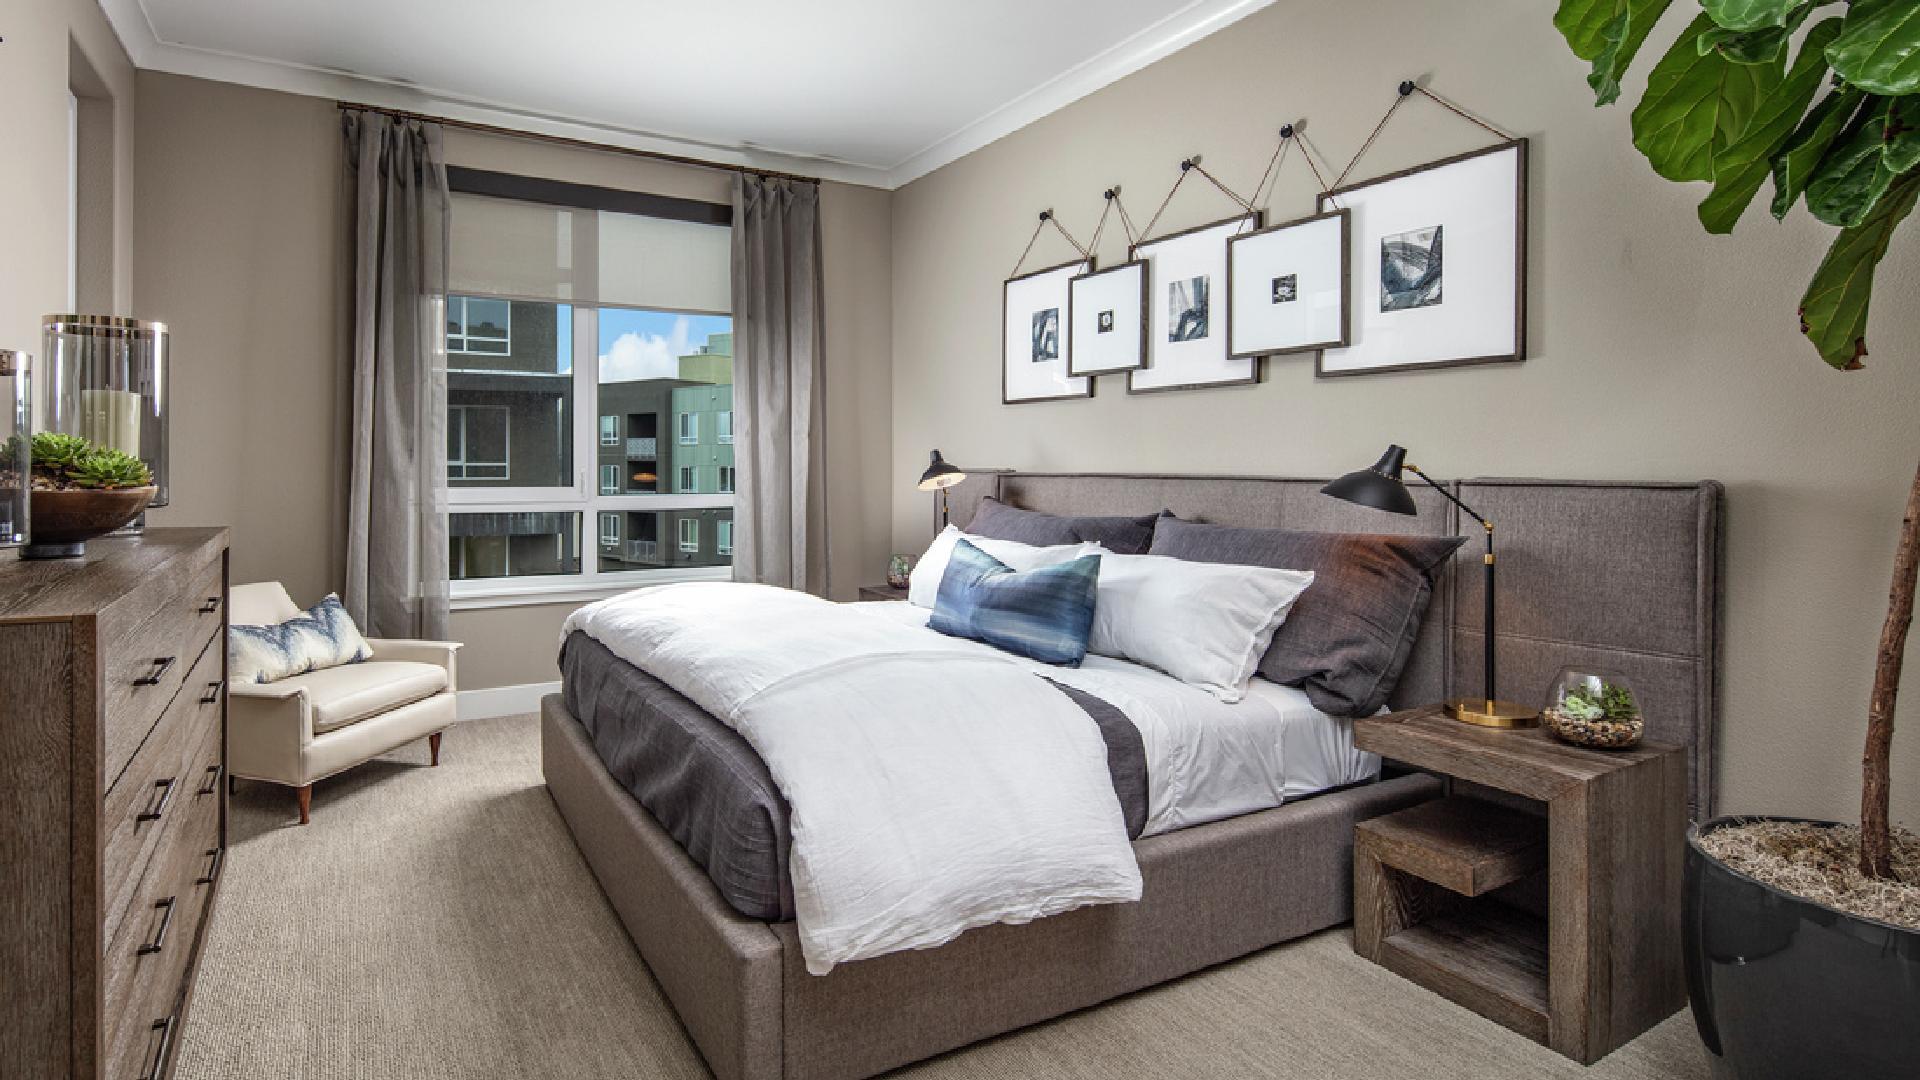 Model home primary bedroom suite